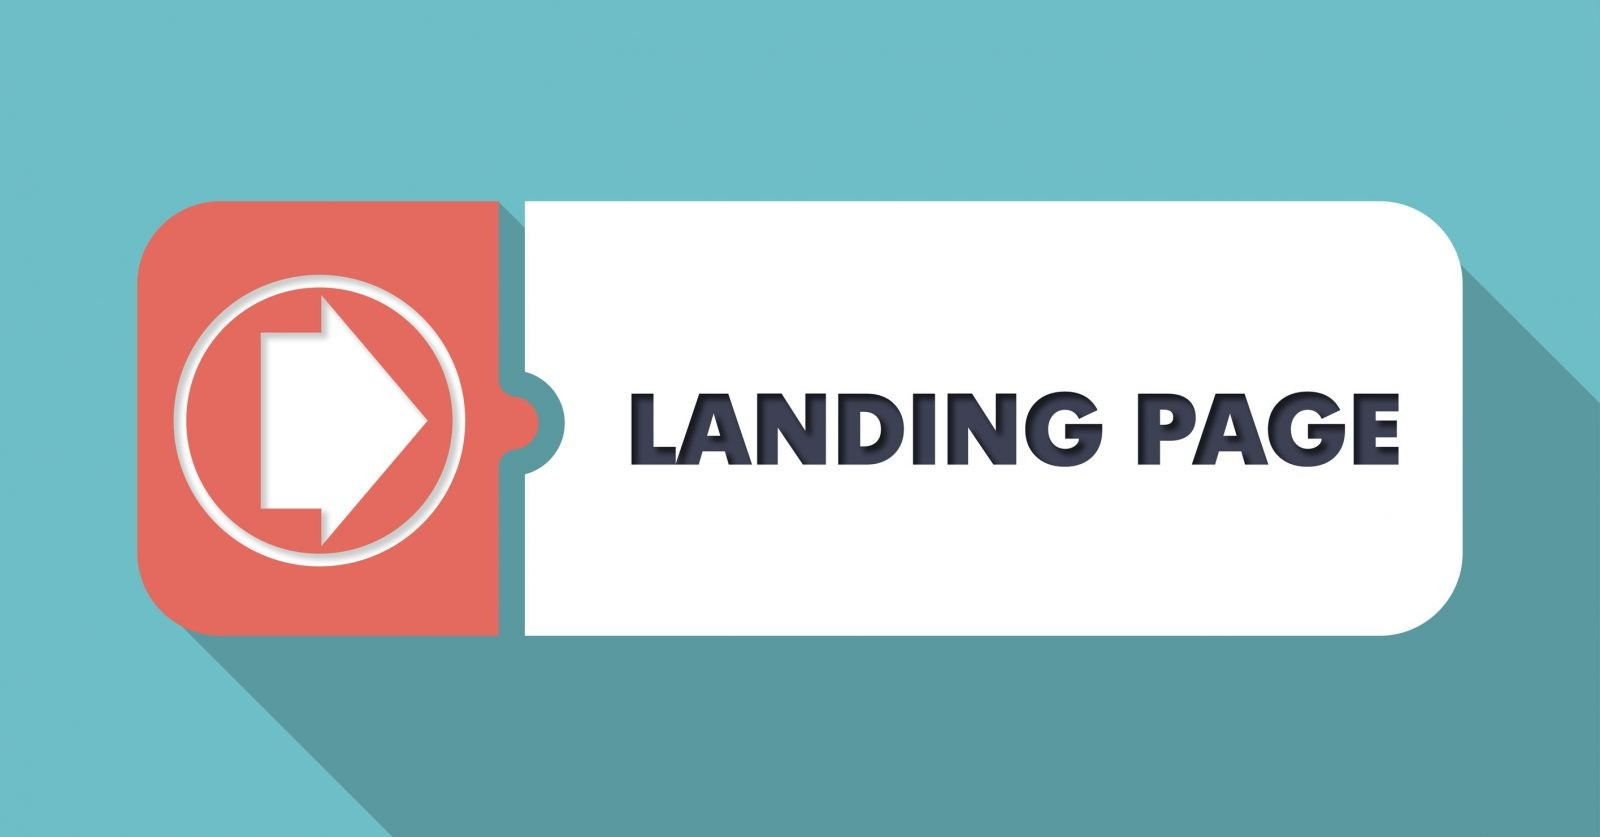 Landing Page, как искусство